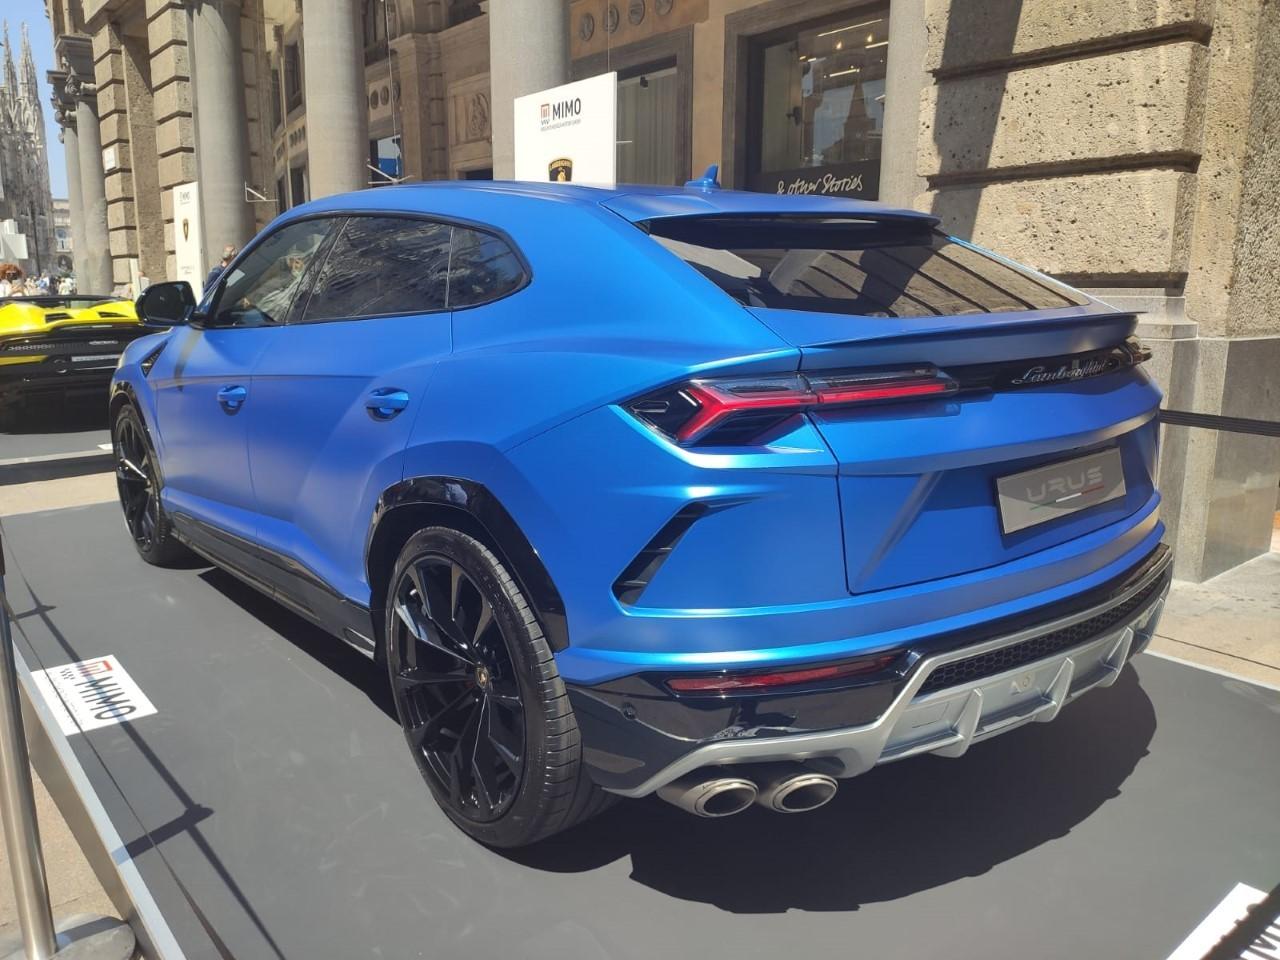 Lamborghini Urus - MiMo 2021